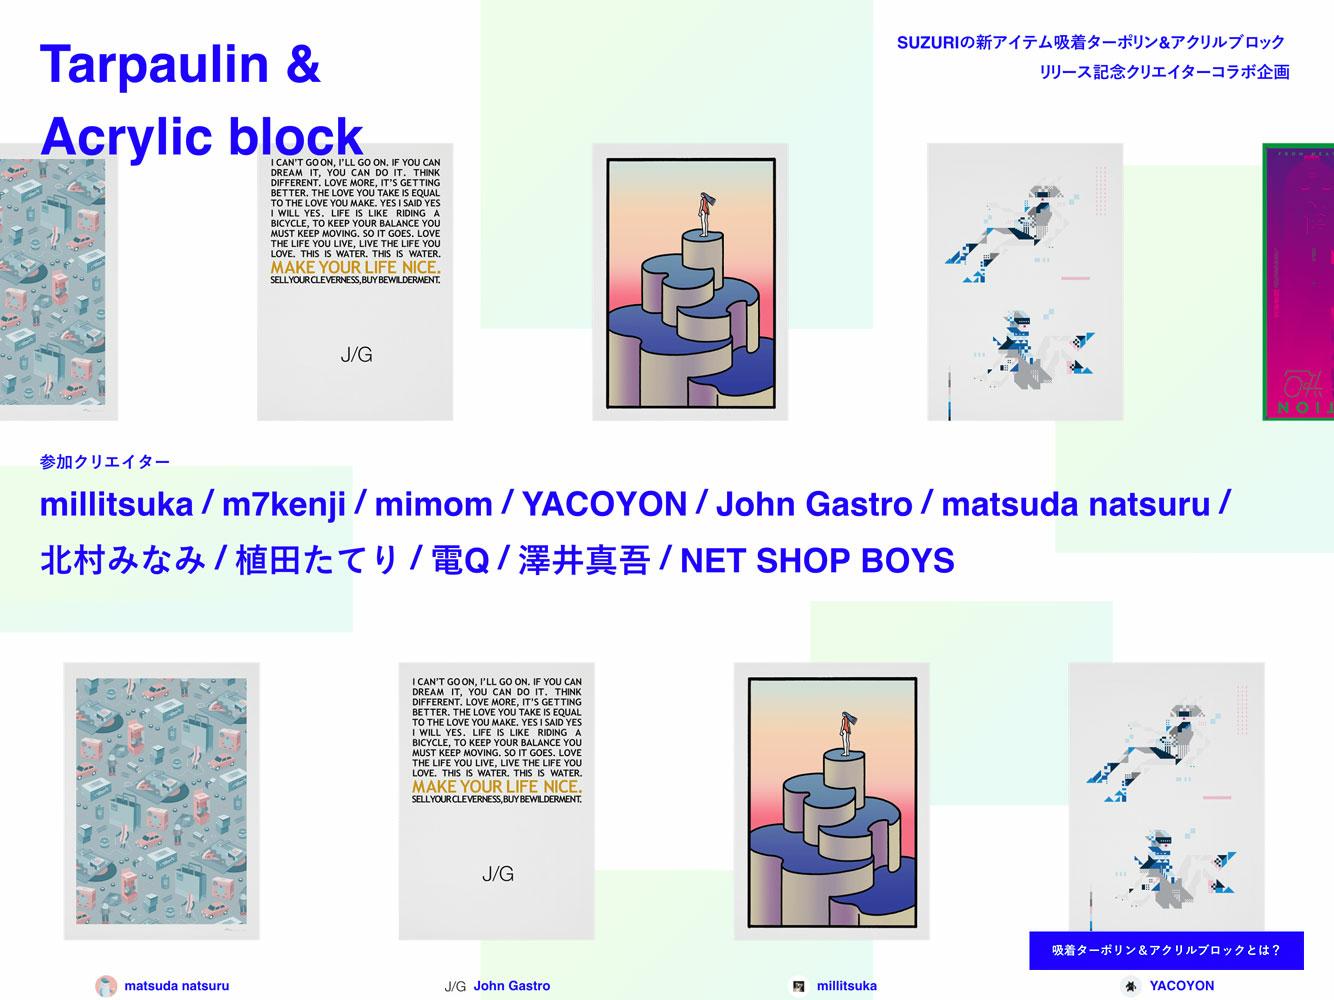 Tarpaulin & Acrylic block - SUZURI web design web